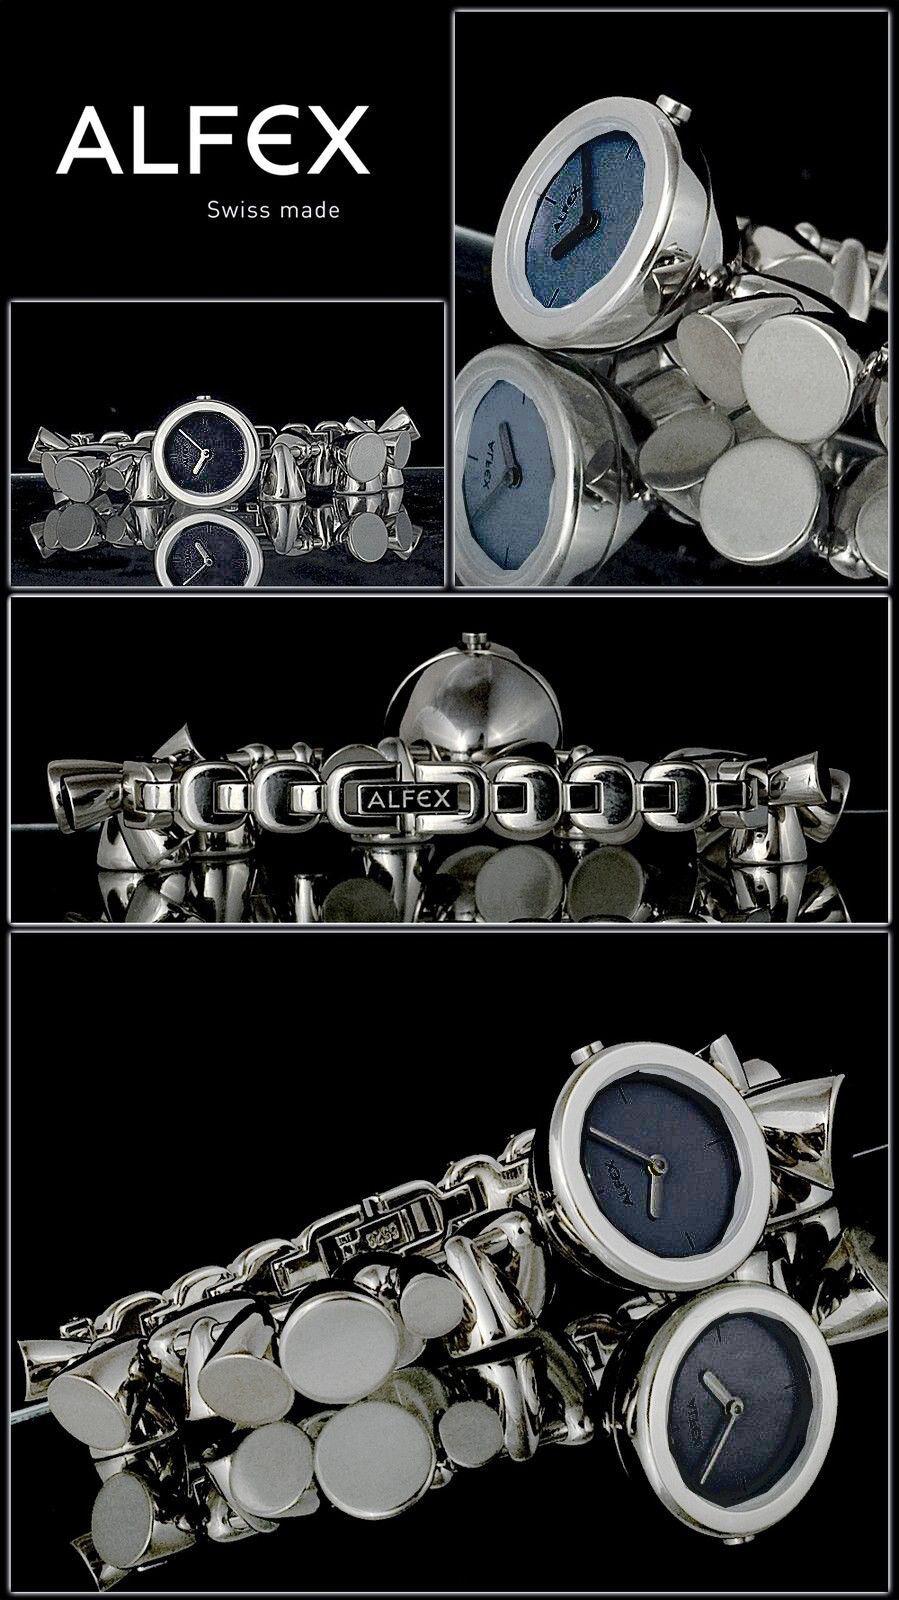 64acaca3e06 Extravagant Alfex Designer Women s Watch Swiss Made Complete ...